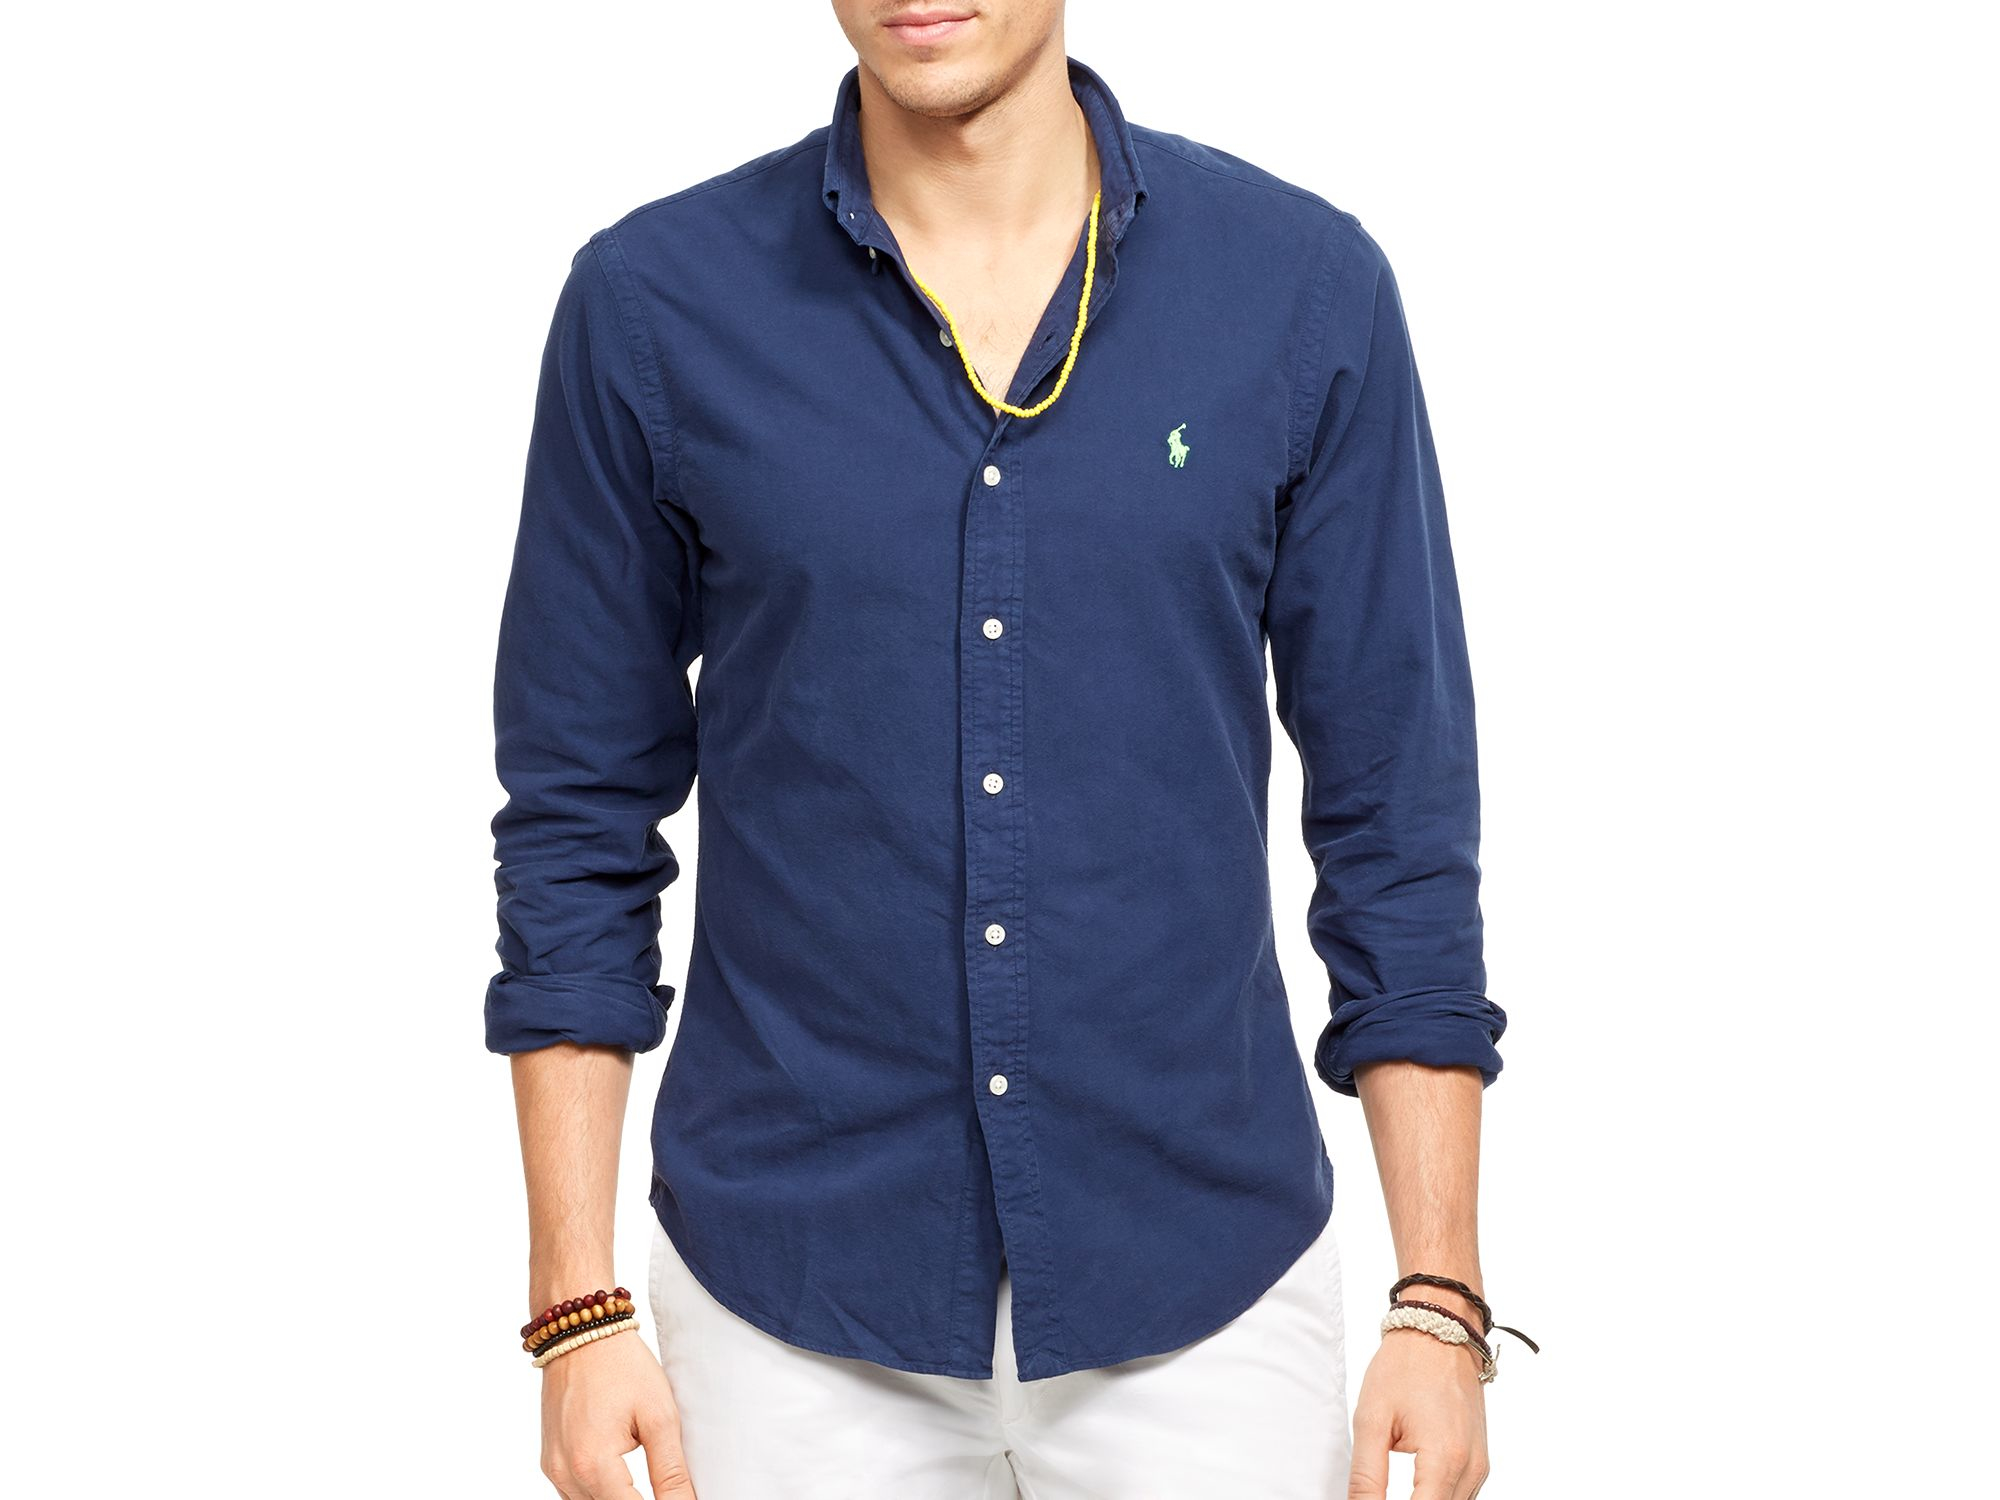 beef6d9dcf06 ... 50% off lyst polo ralph lauren oxford shirt slim fit in blue for men  3768d